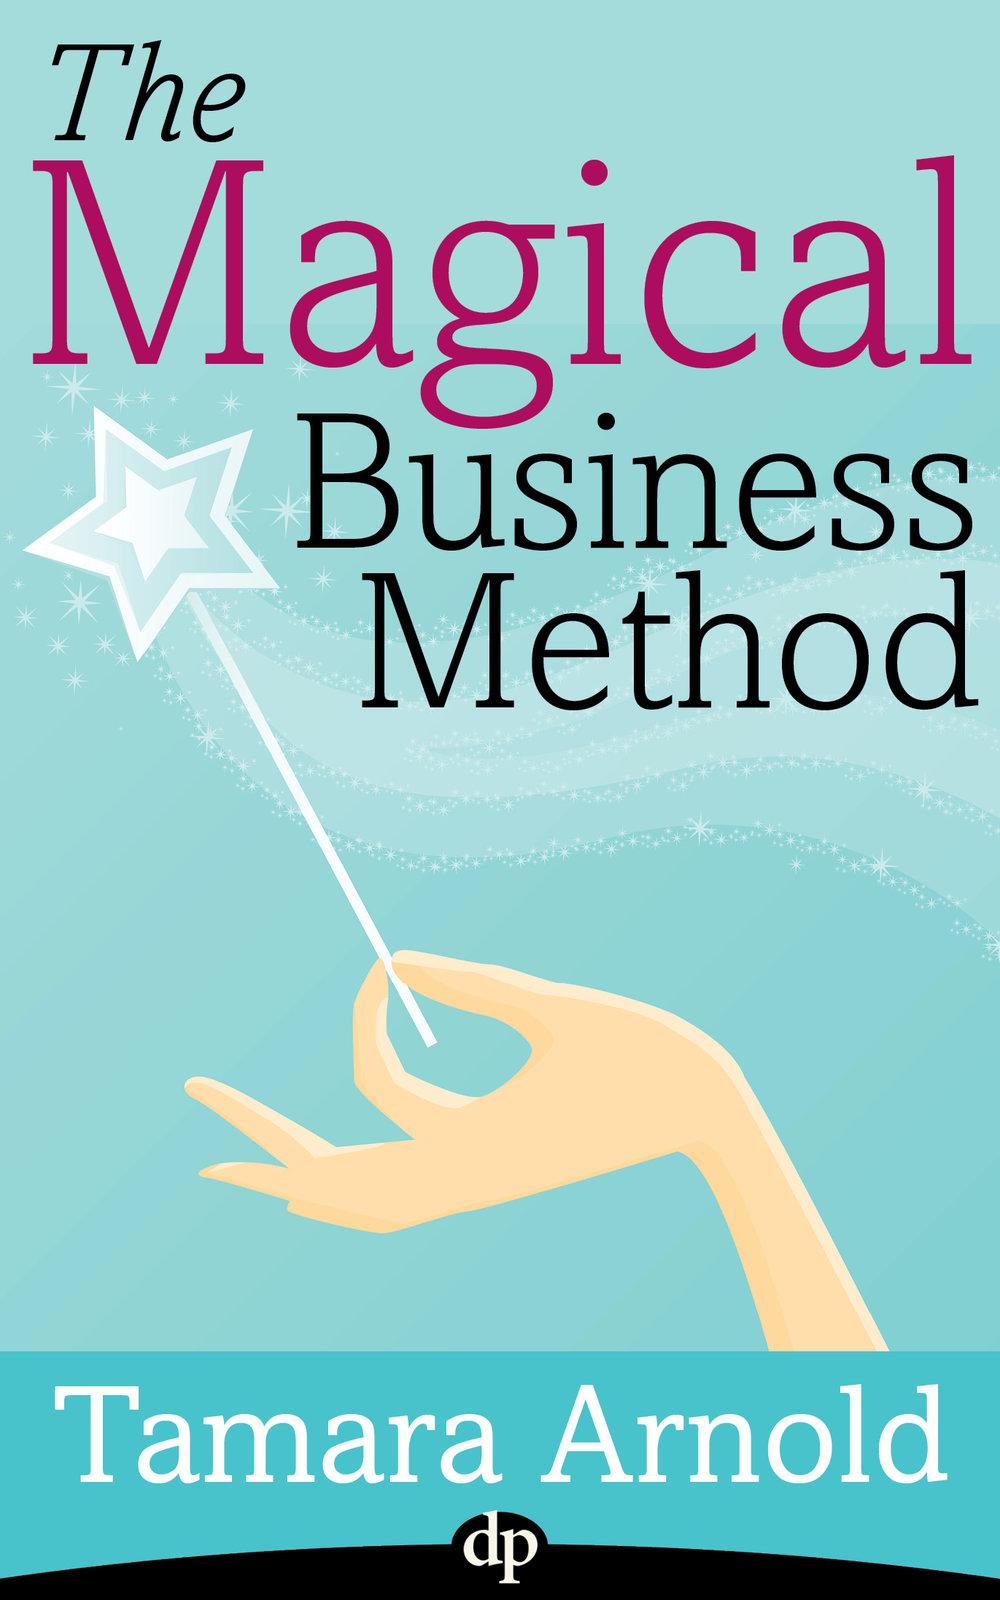 Arnold_The Magical Business Method_EBKA.jpg